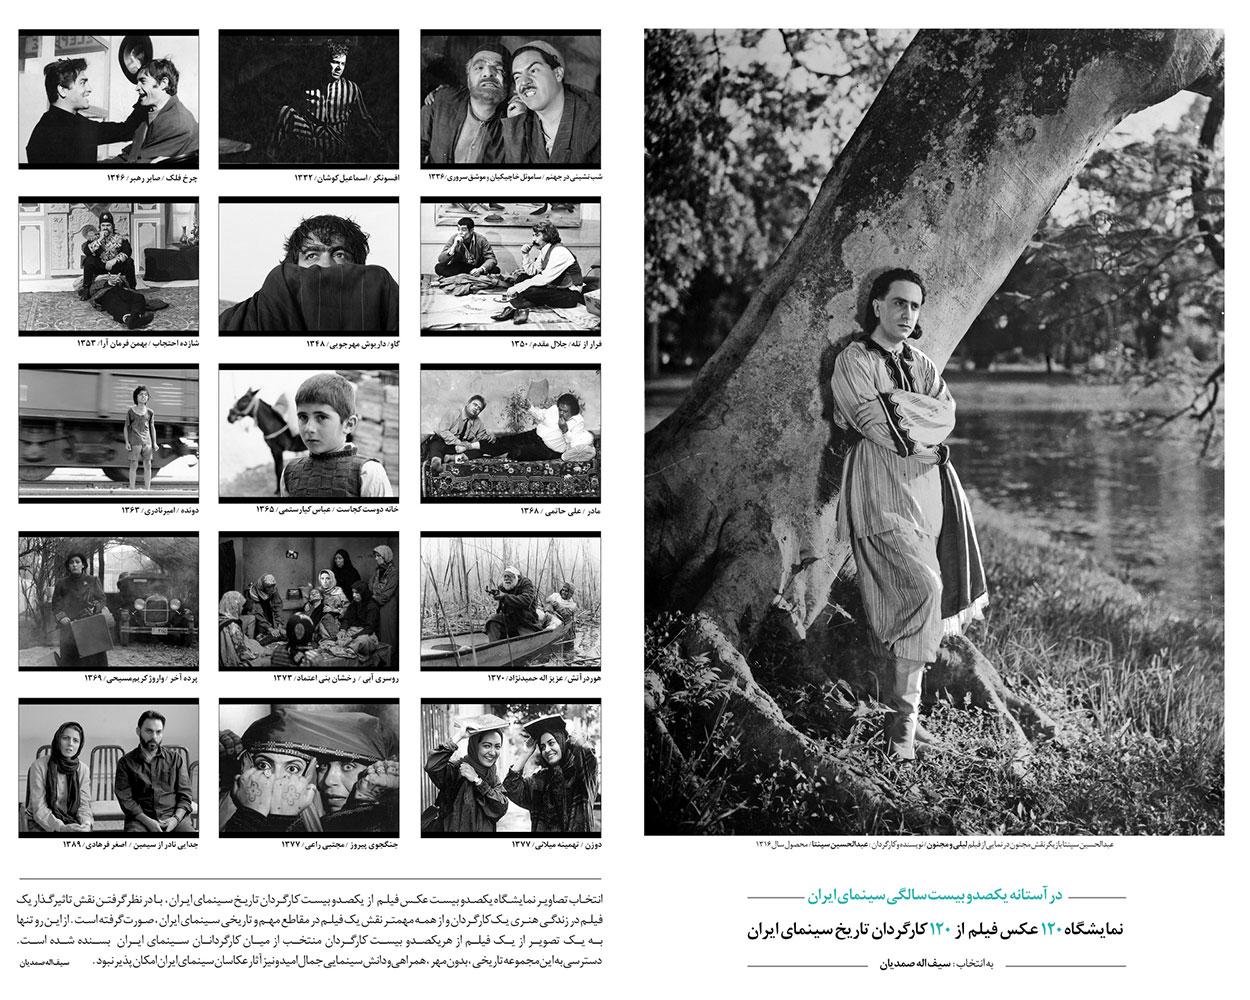 See 120 Years of Iranian Cinema Through 120 Photos in FIFF Exhibit